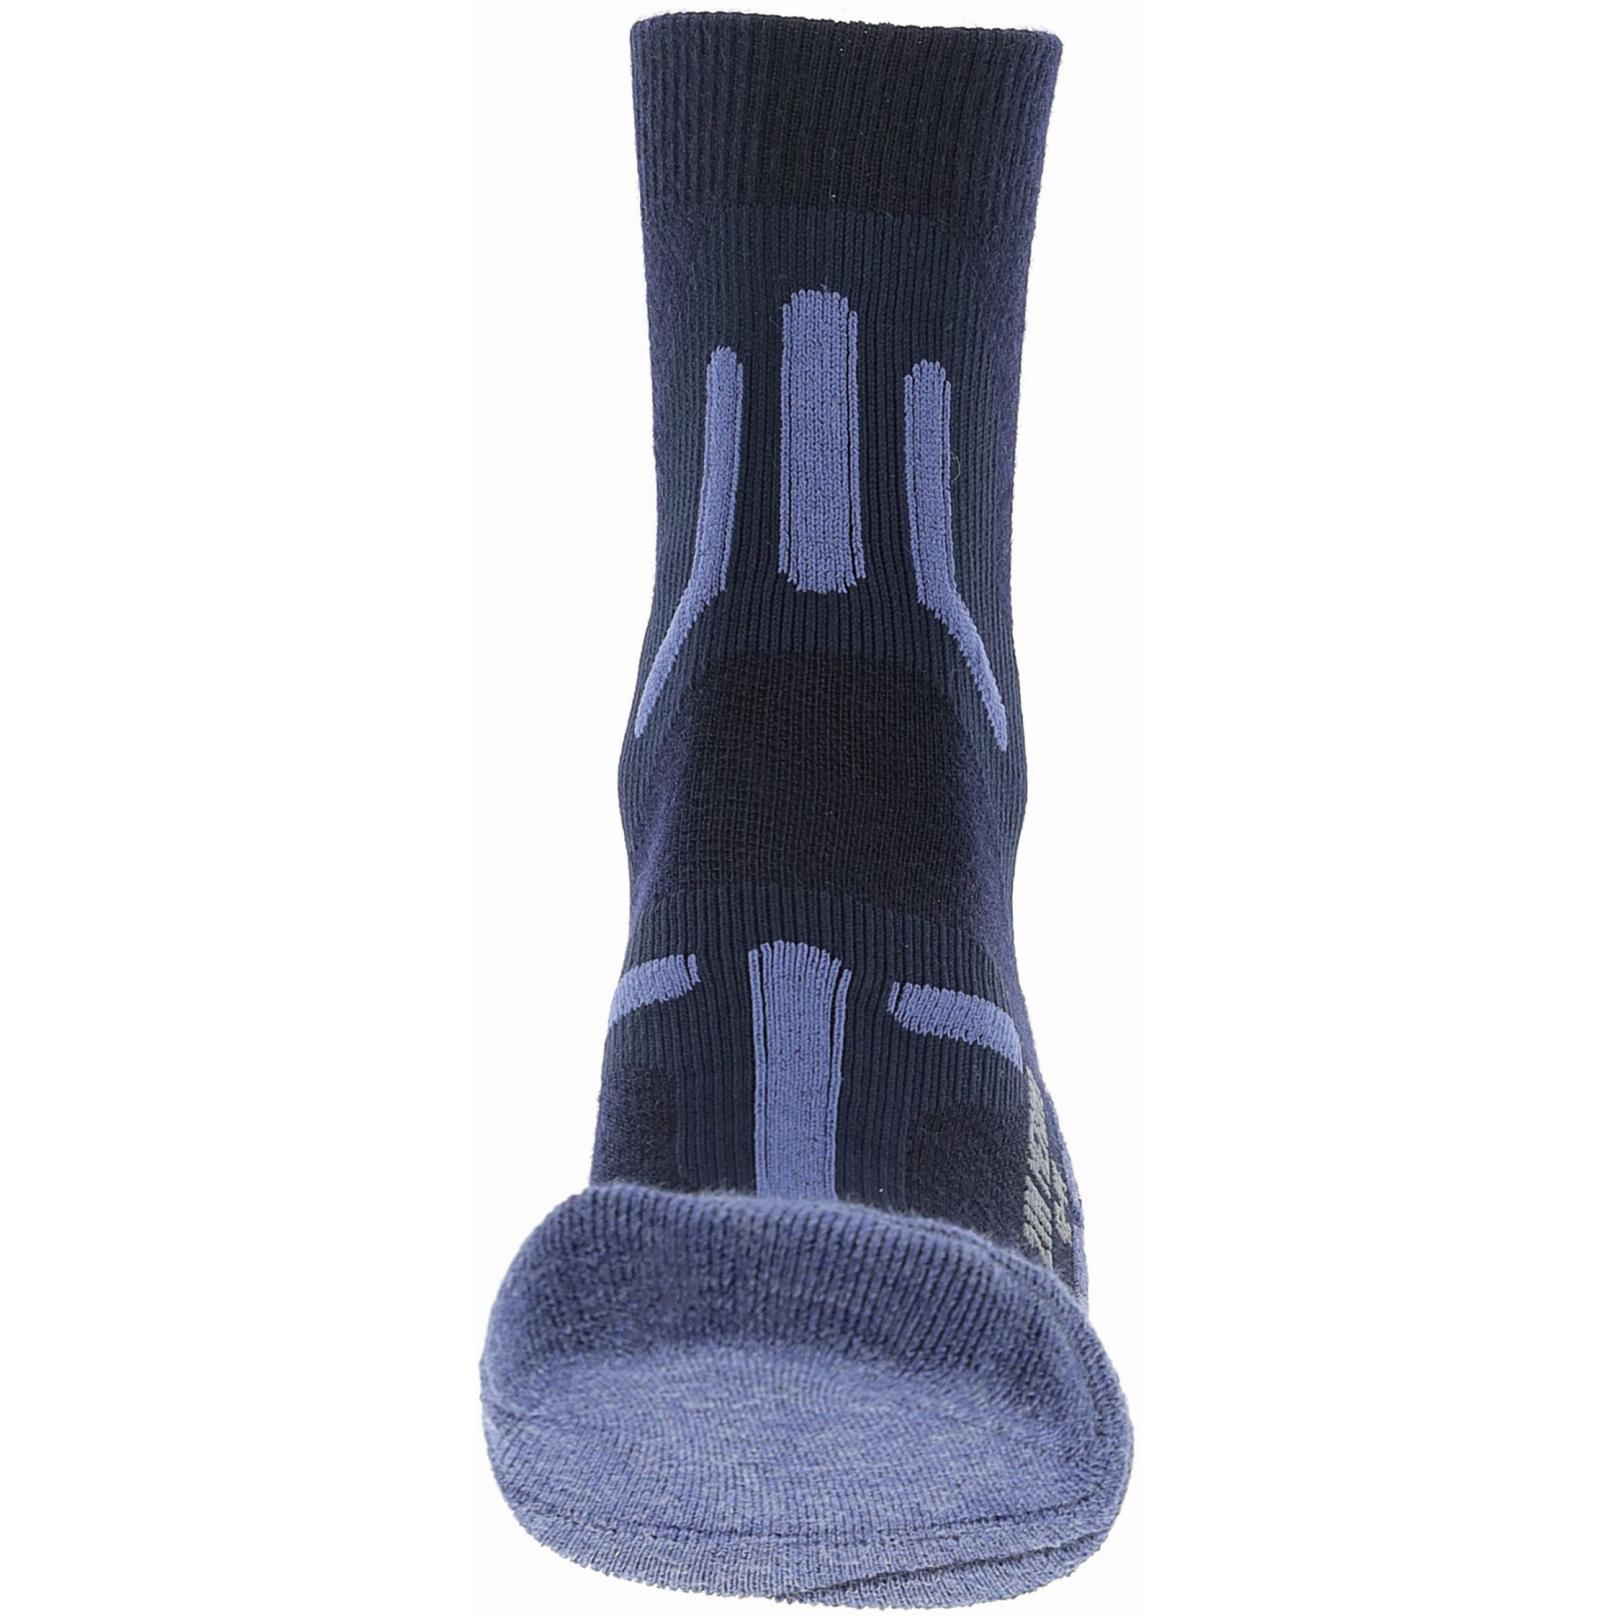 Image of UYN Trekking 2In Merino Socks - Navy/Jeans